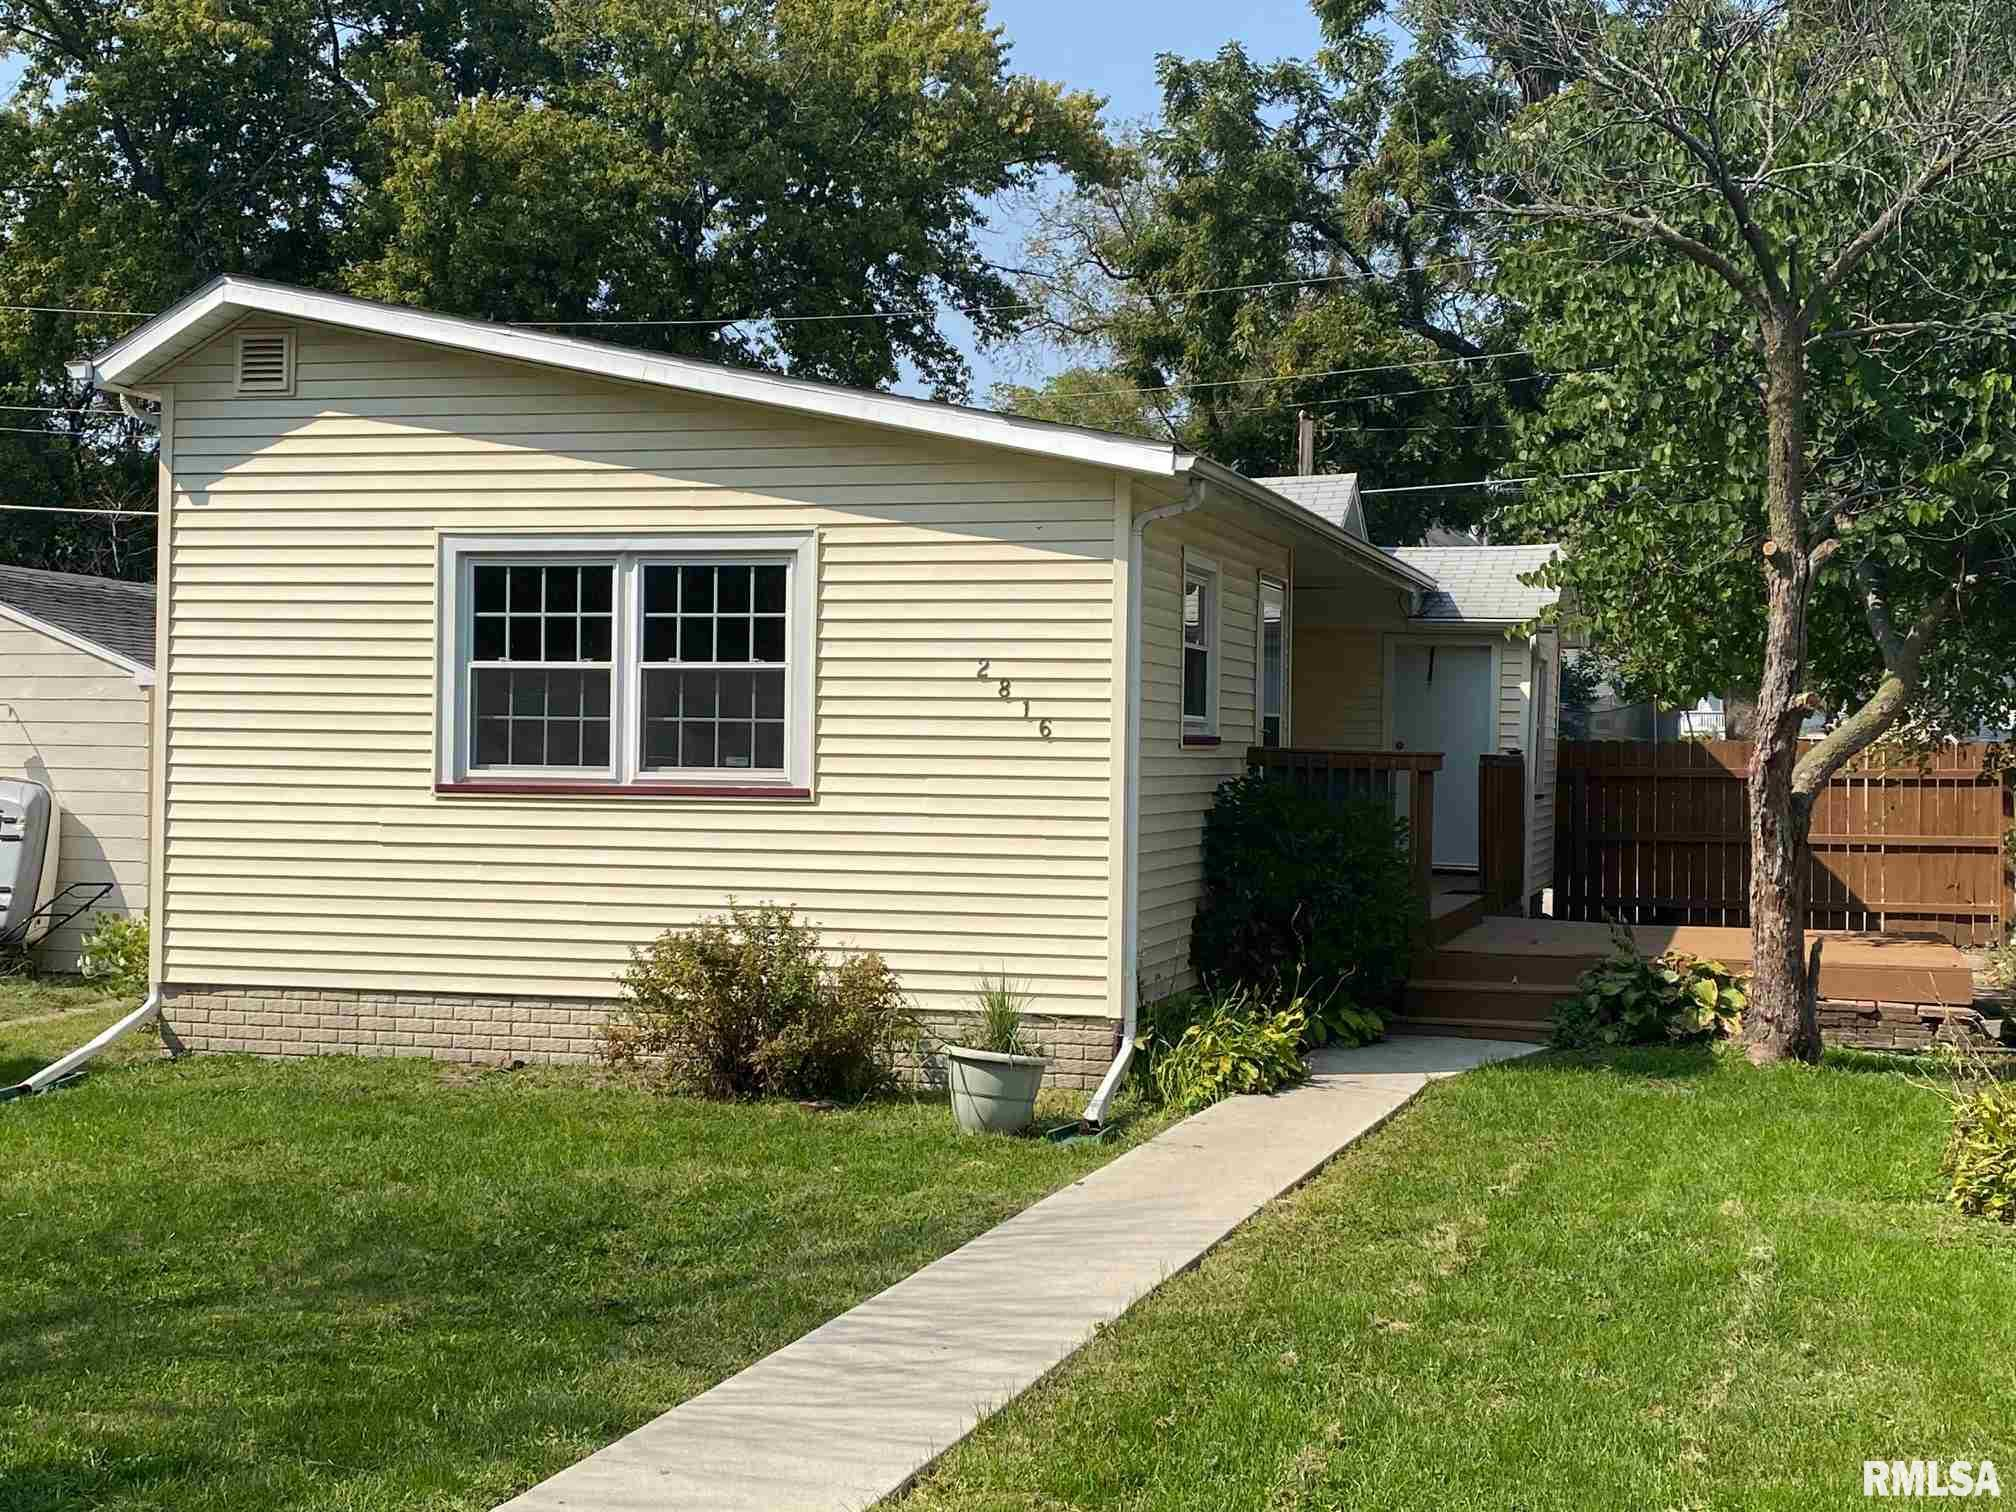 2816 WHITEWOOD Property Photo - Davenport, IA real estate listing